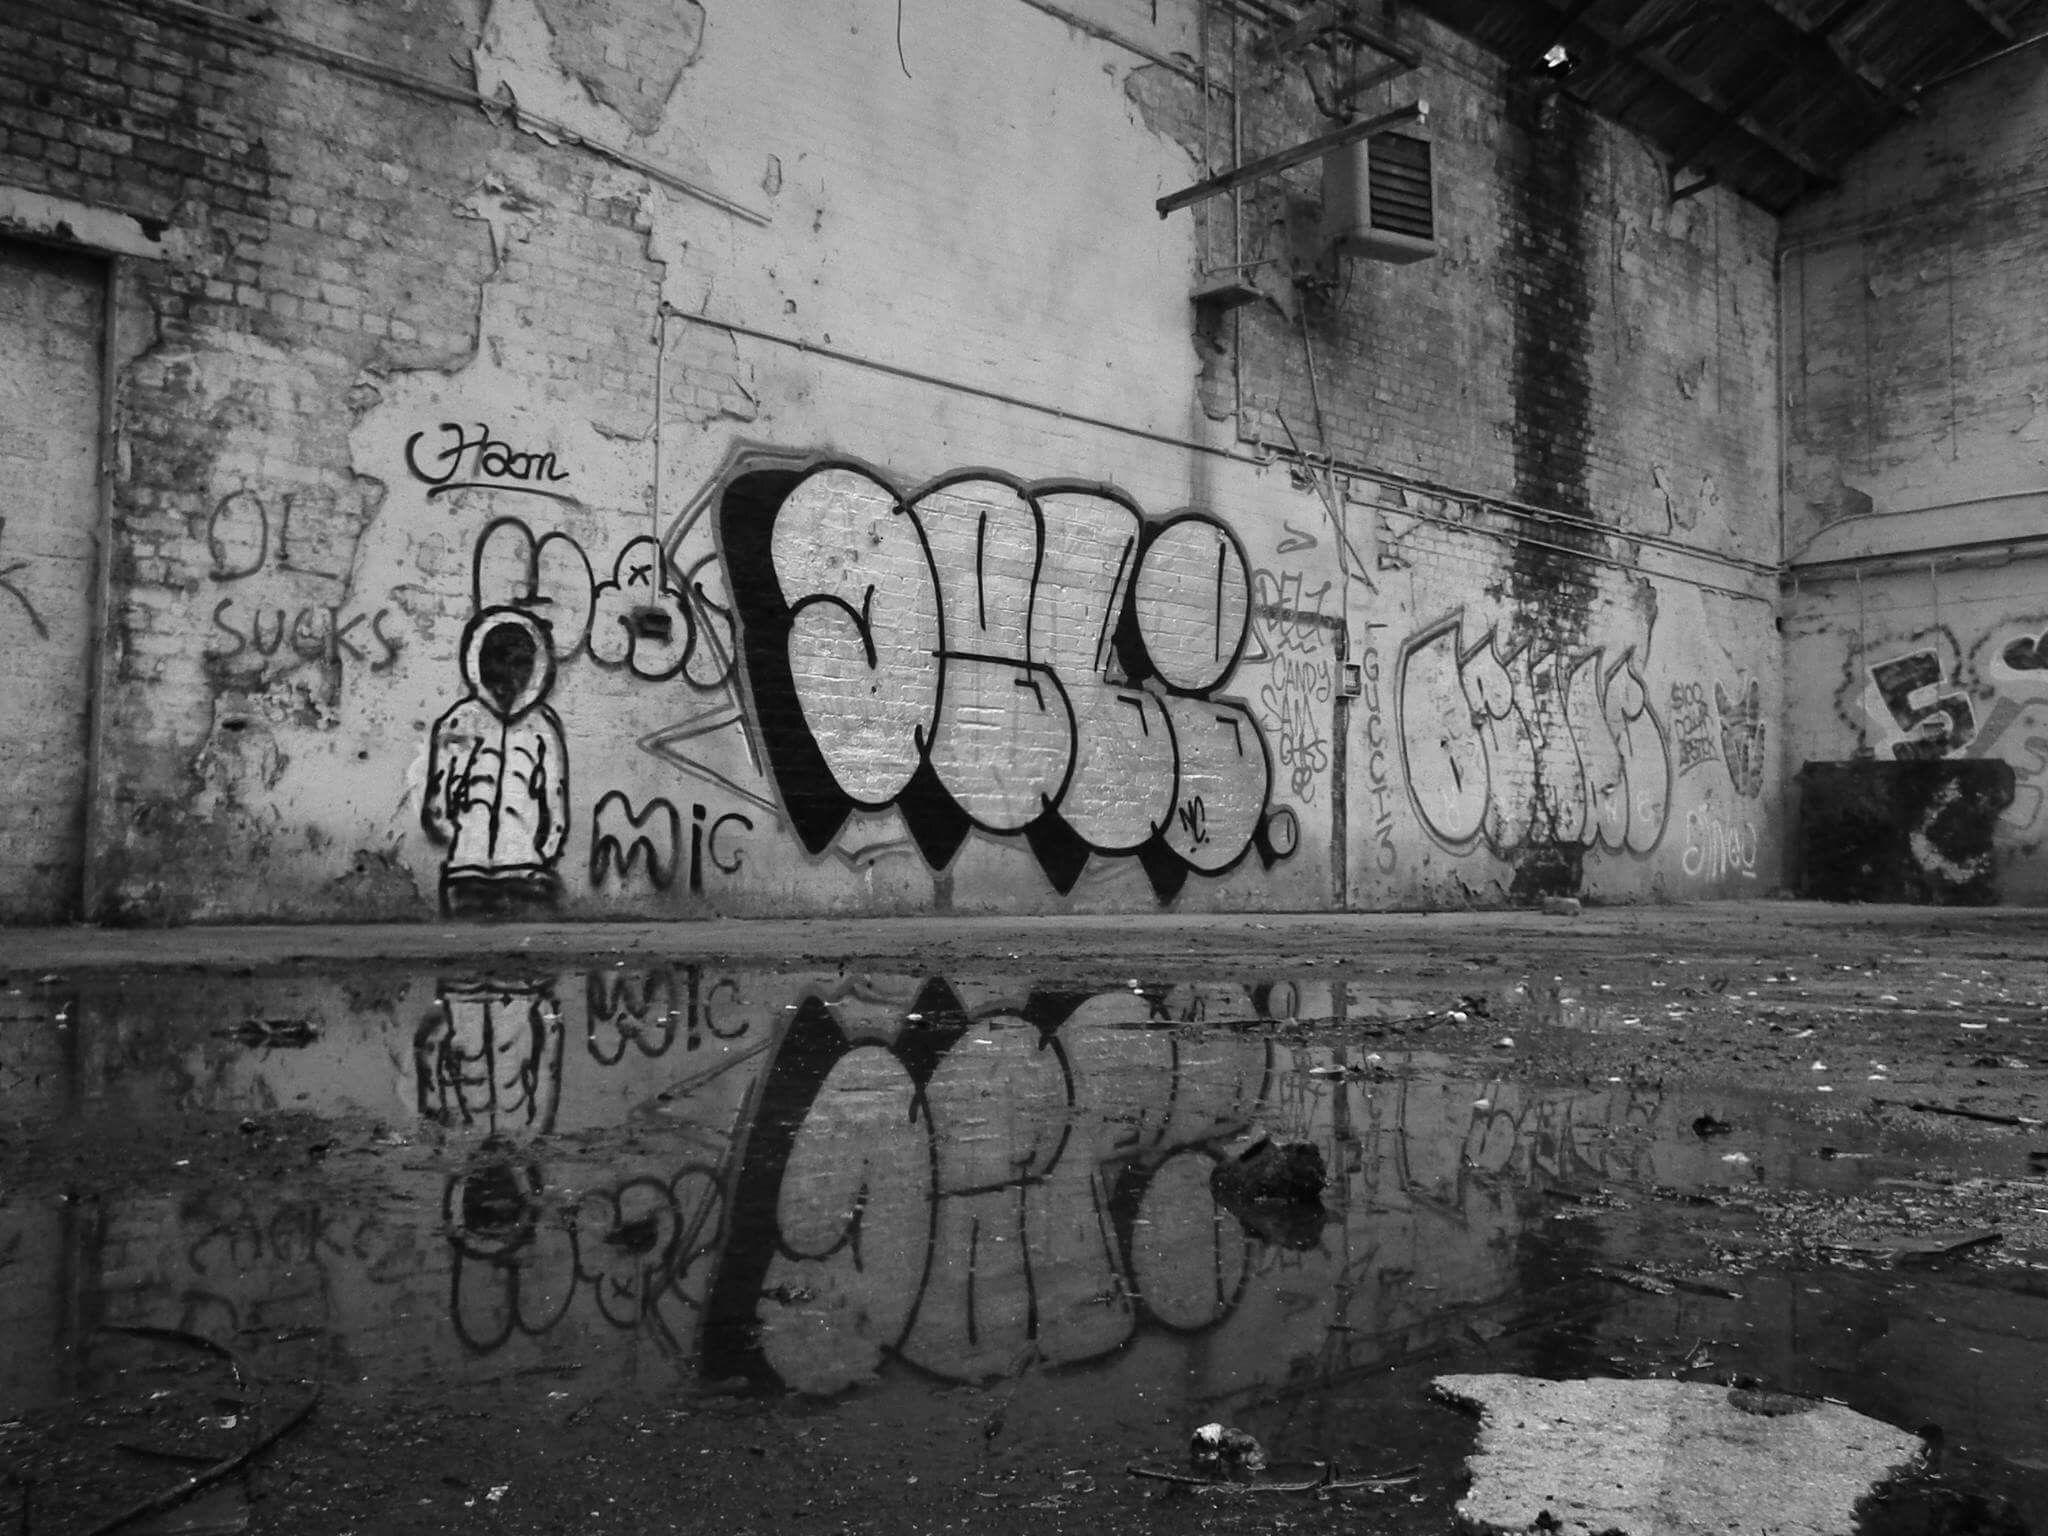 Pin by alanna taddei on graffiti pinterest graffiti